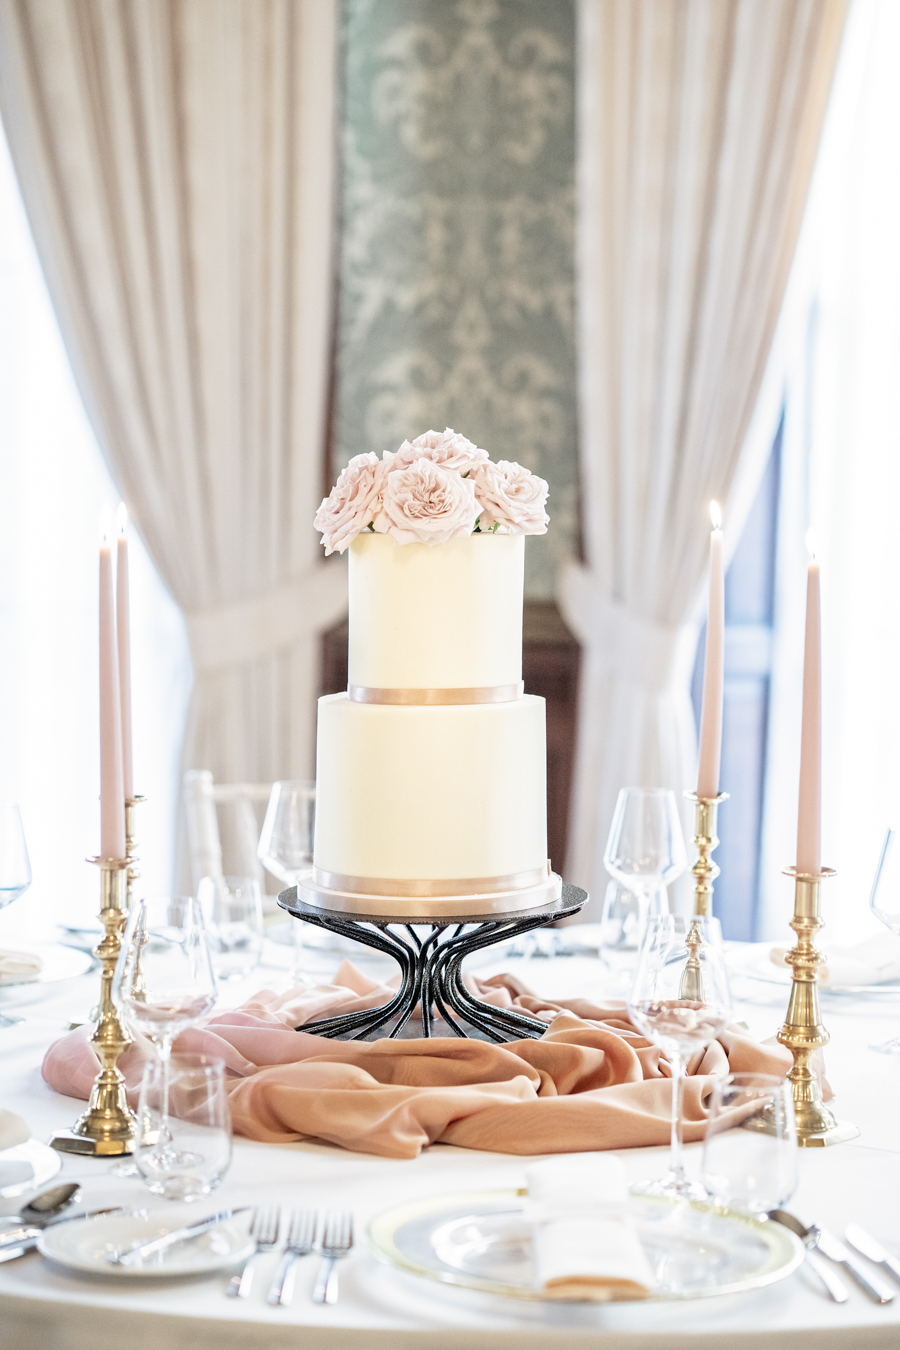 Cheshire wedding inspiration, image credit Victoria Amrose Photography on English-Wedding.com